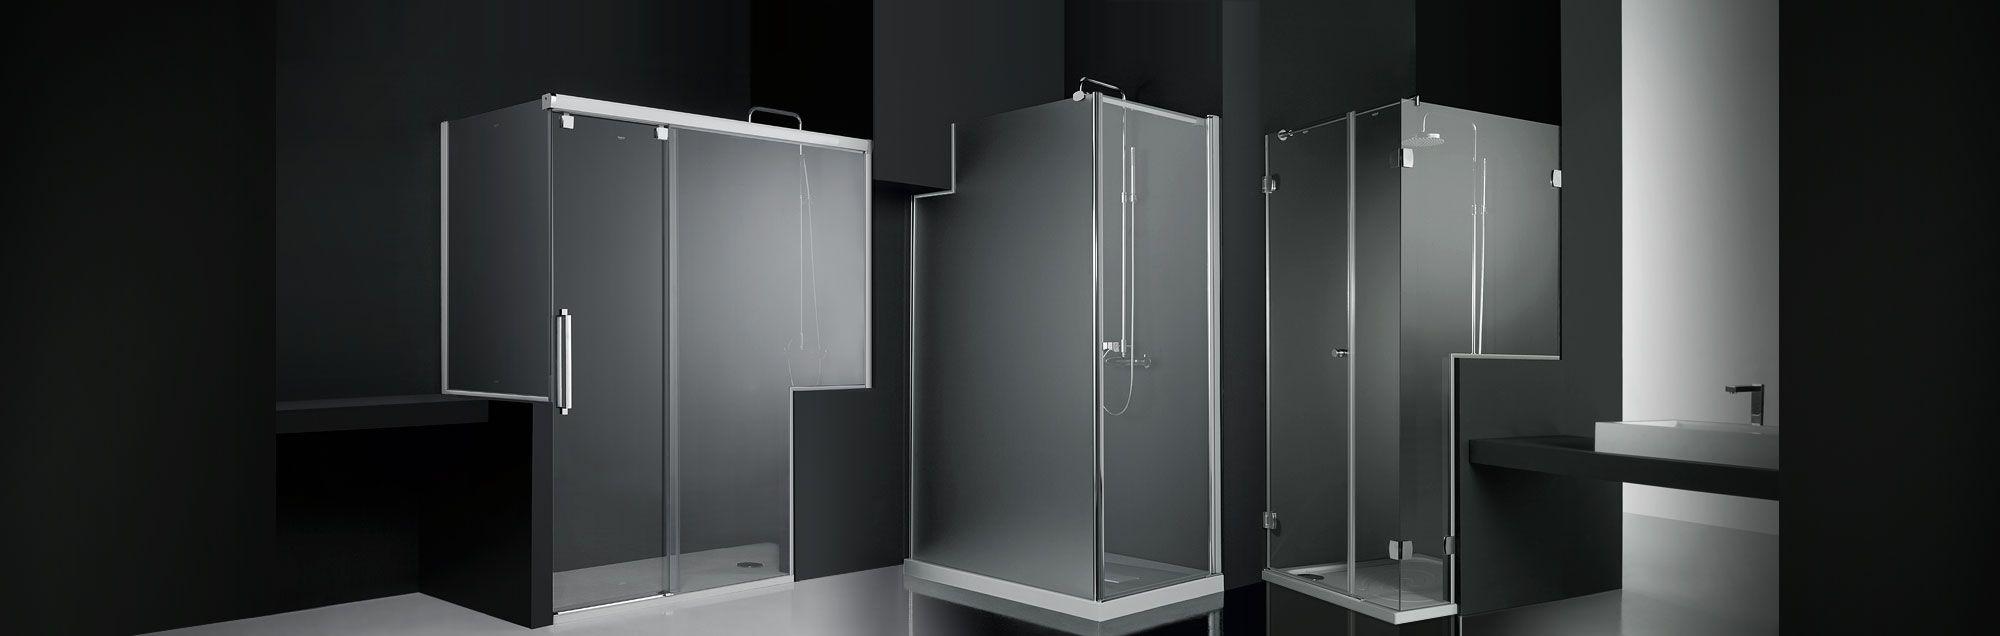 Mamparas Para Baño A Medida:Mamparas especiales de baño a medida PROFILTEK